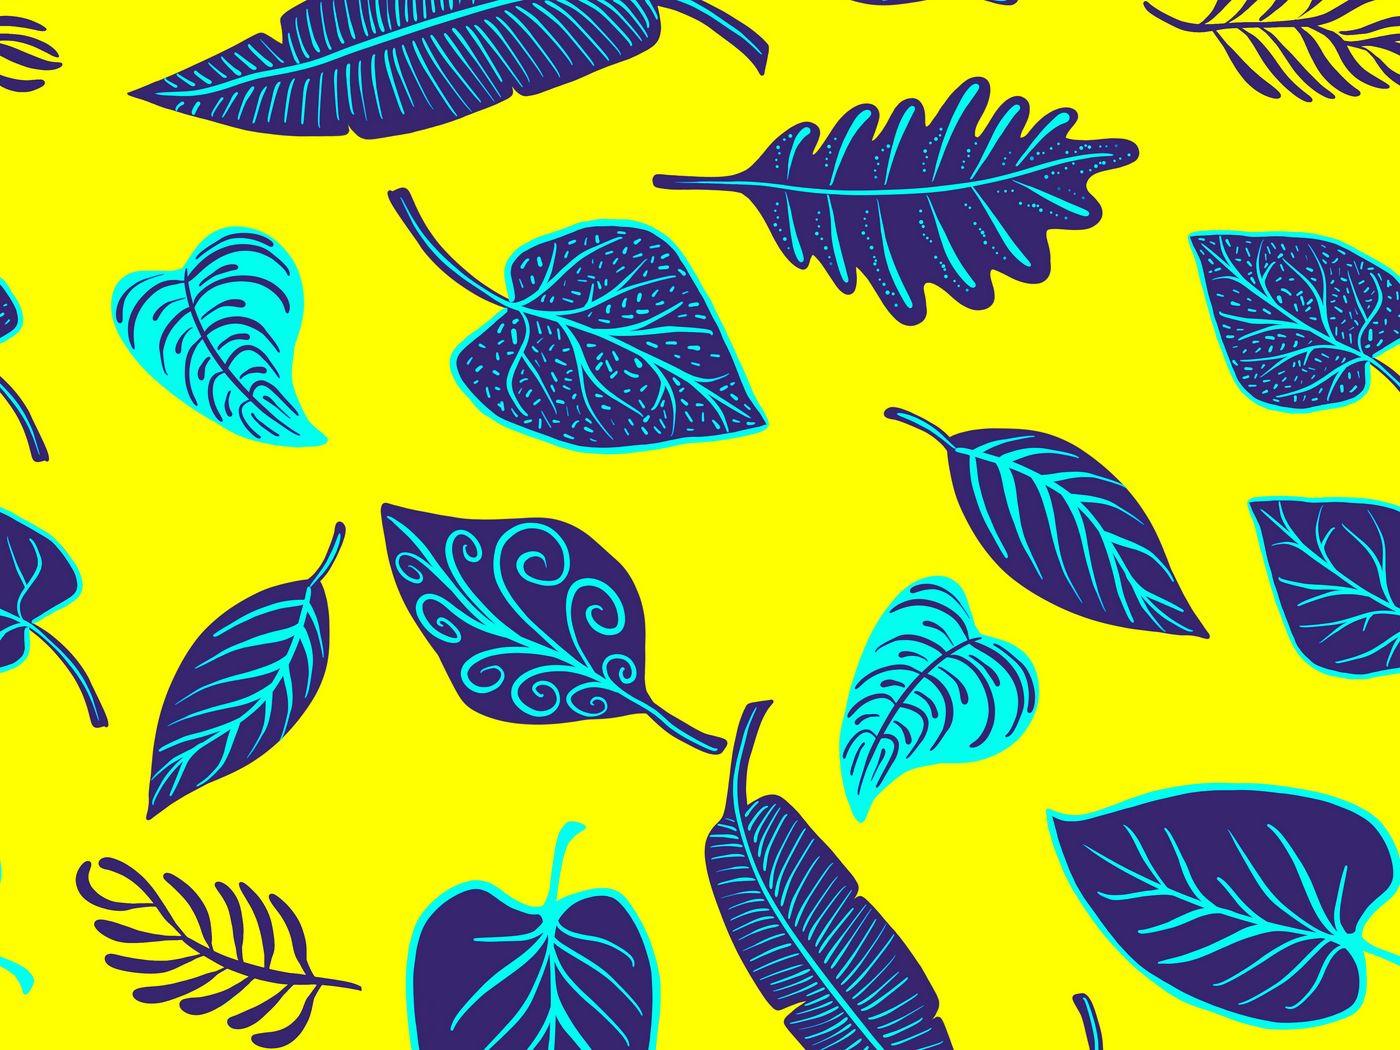 1400x1050 Wallpaper leaves, art, yellow, purple, shapes